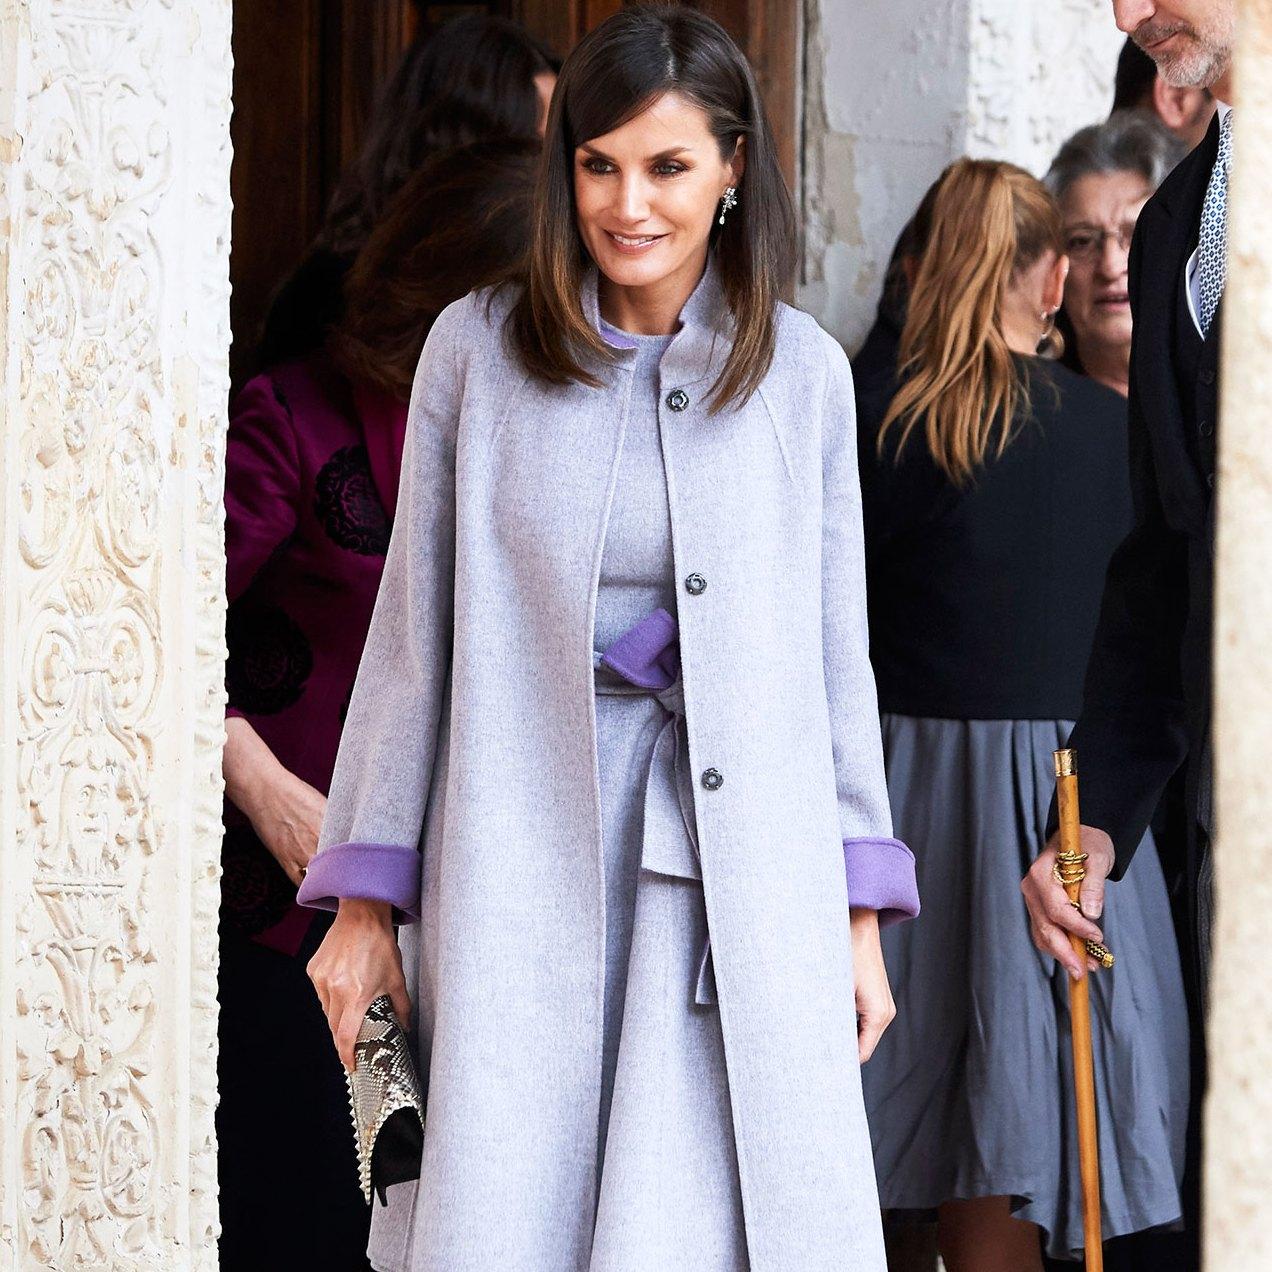 Queen Letizia of Spain Queen Letizia Makes a Lavender Outfit Look Grown-Up